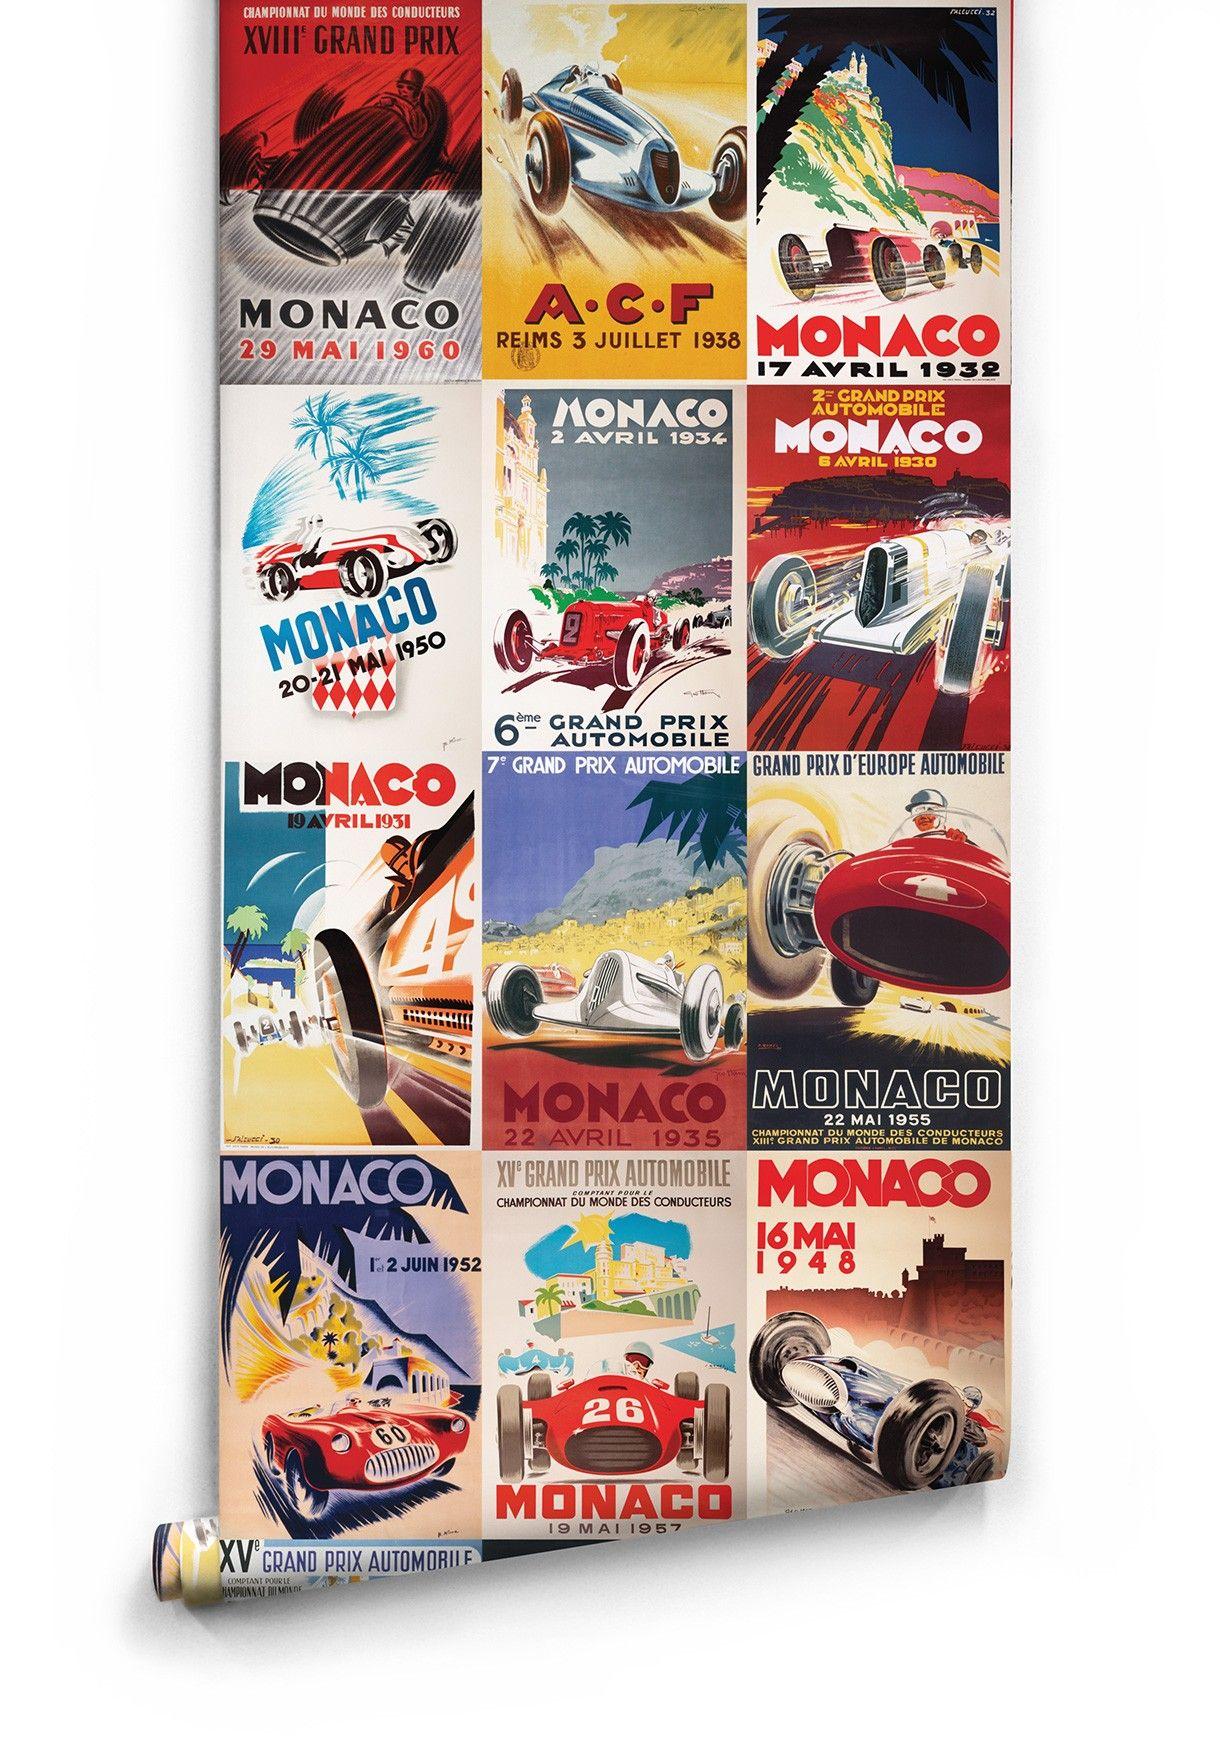 Circuit de Monaco Roll